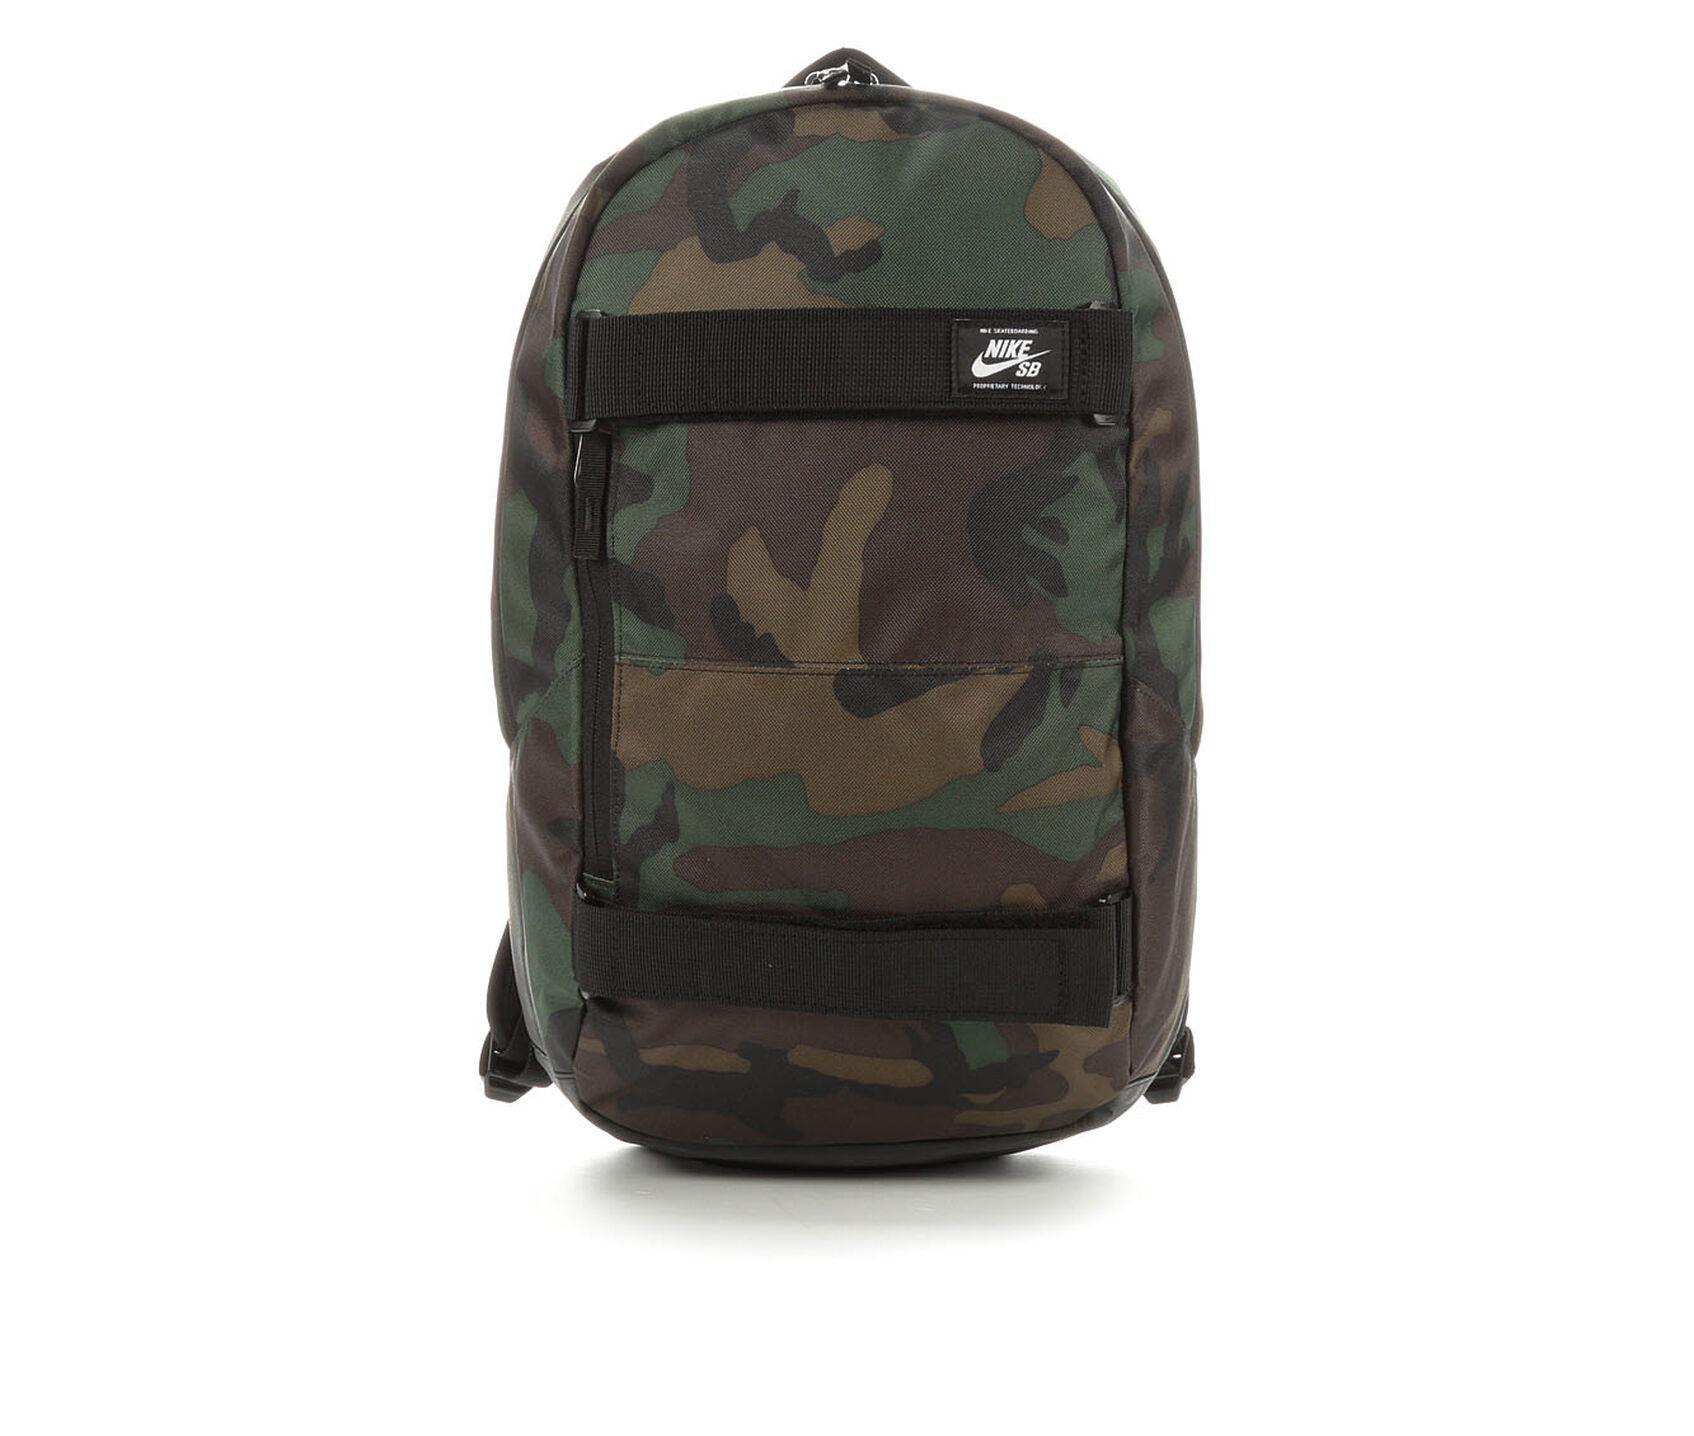 Nike SB Print Backpack. Carousel Controls d0d559163c88d